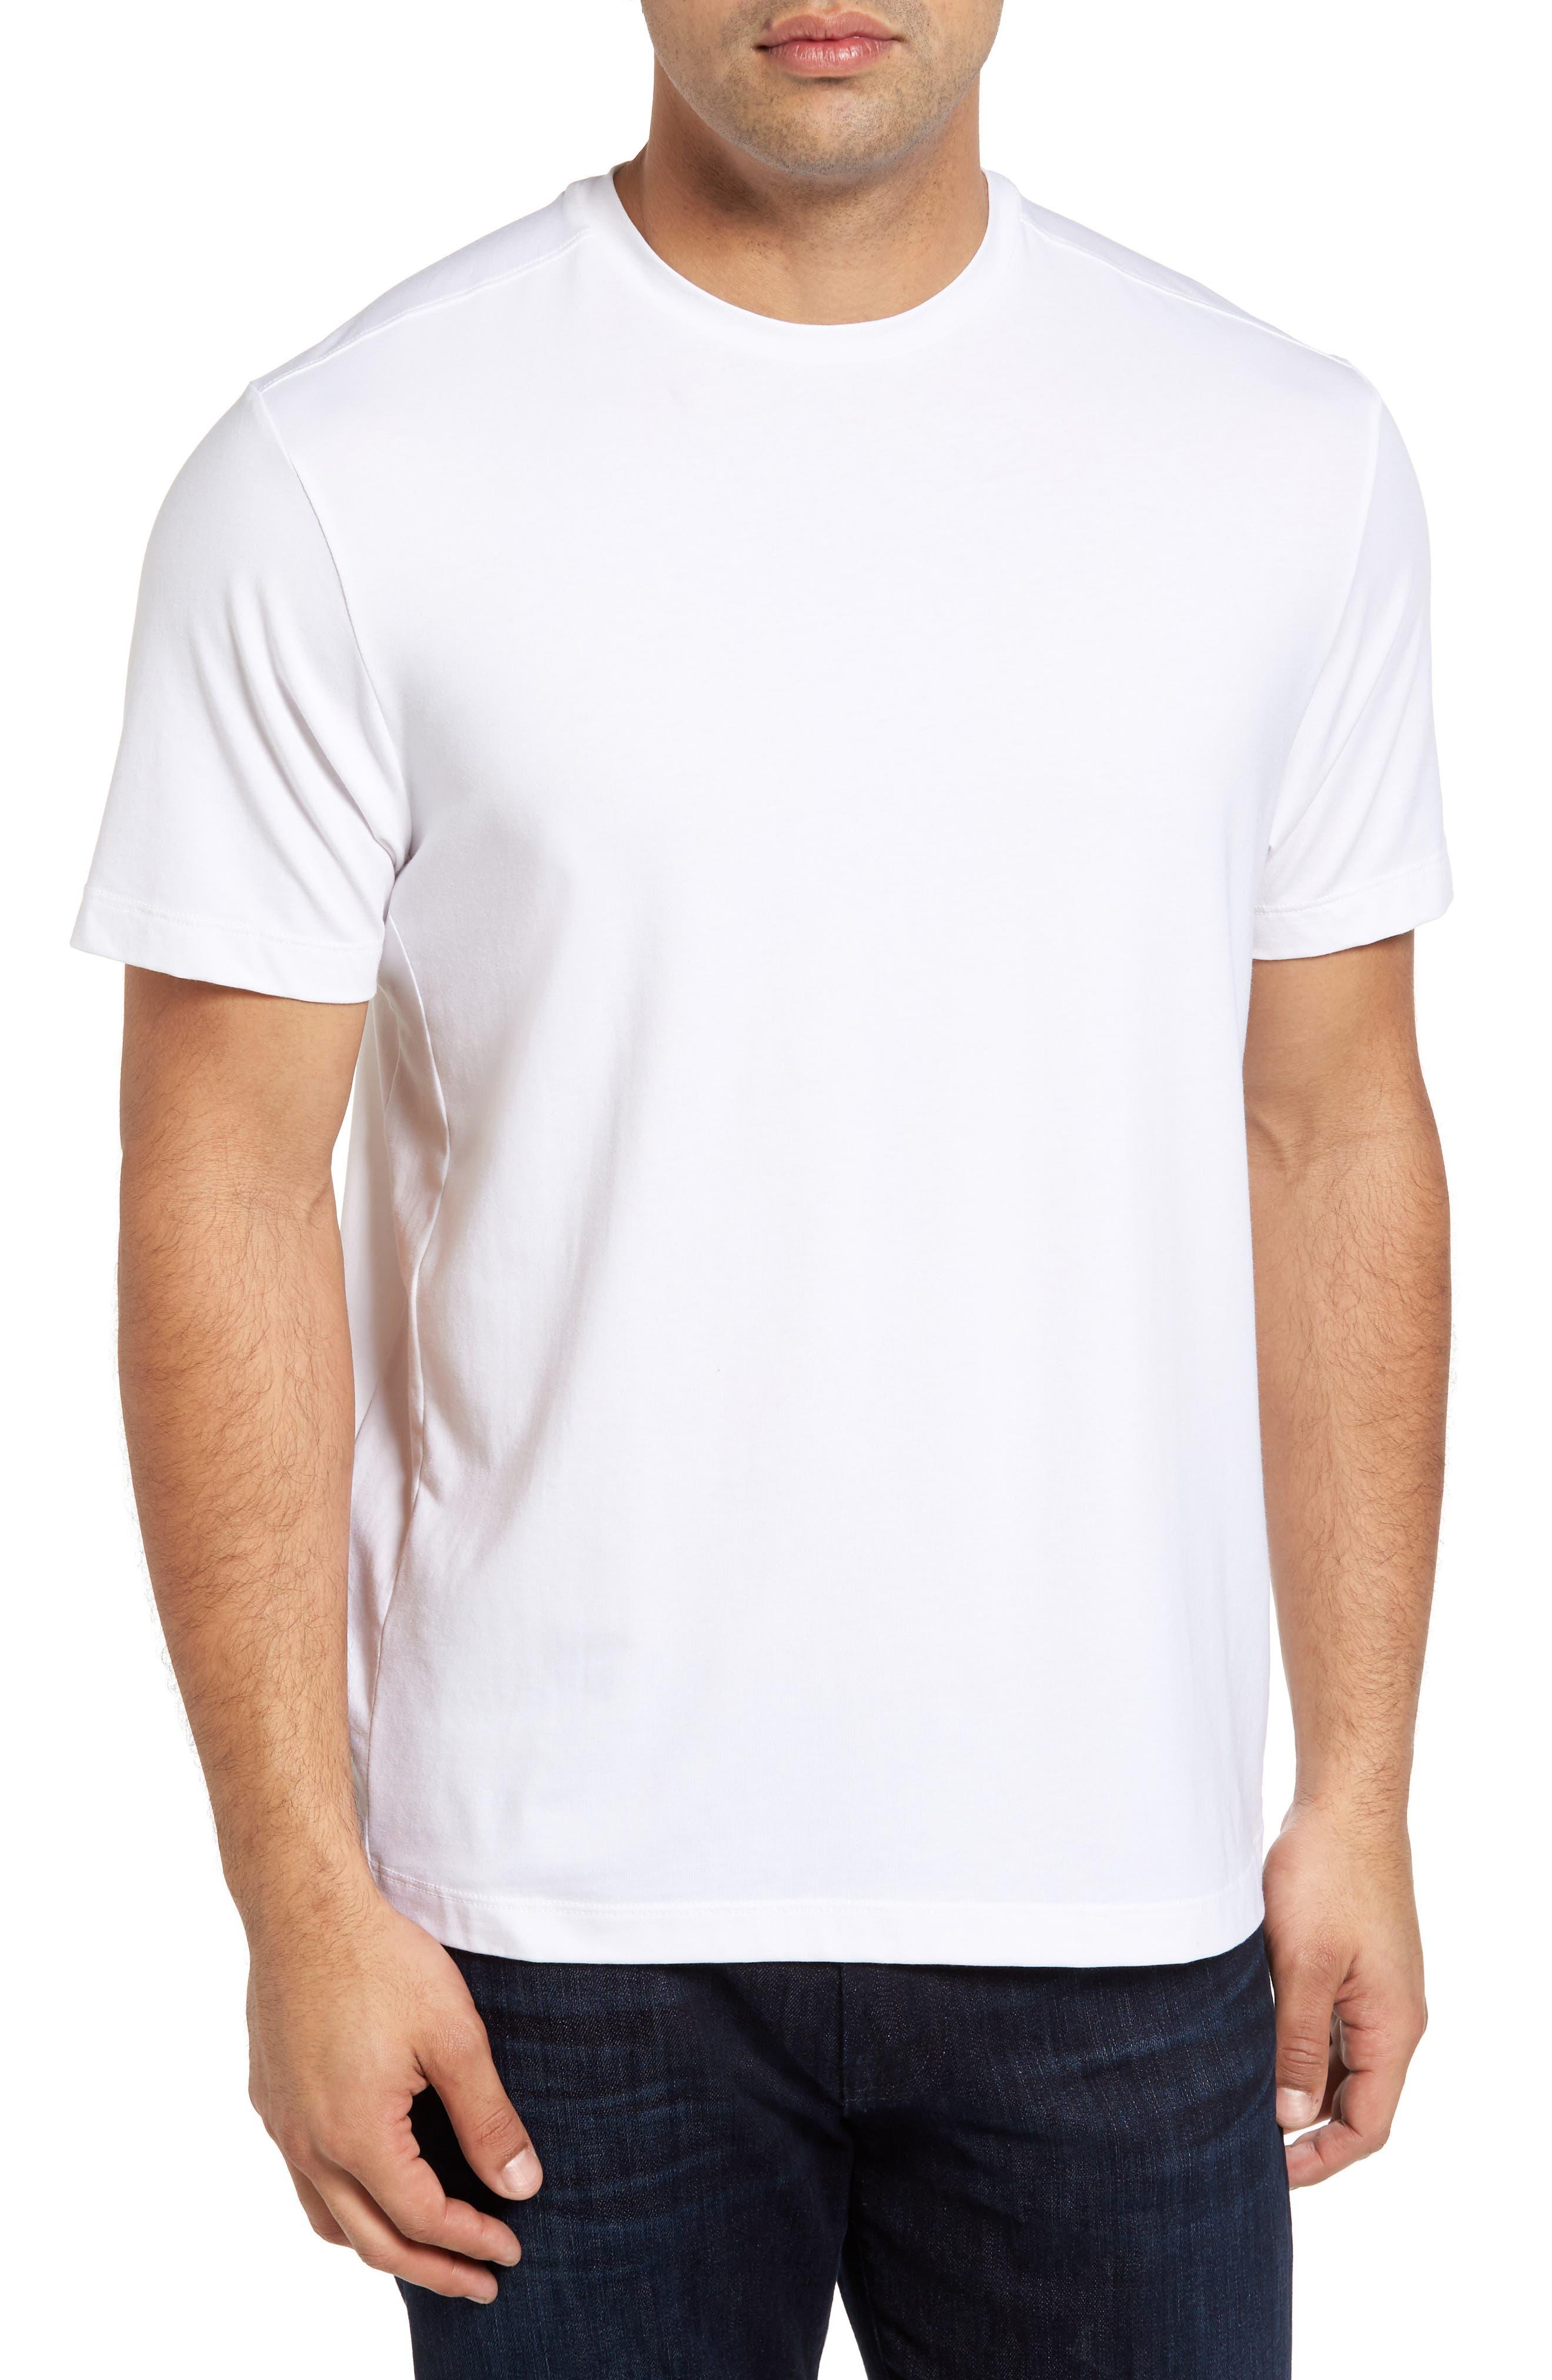 Tropicool T-Shirt,                             Main thumbnail 6, color,